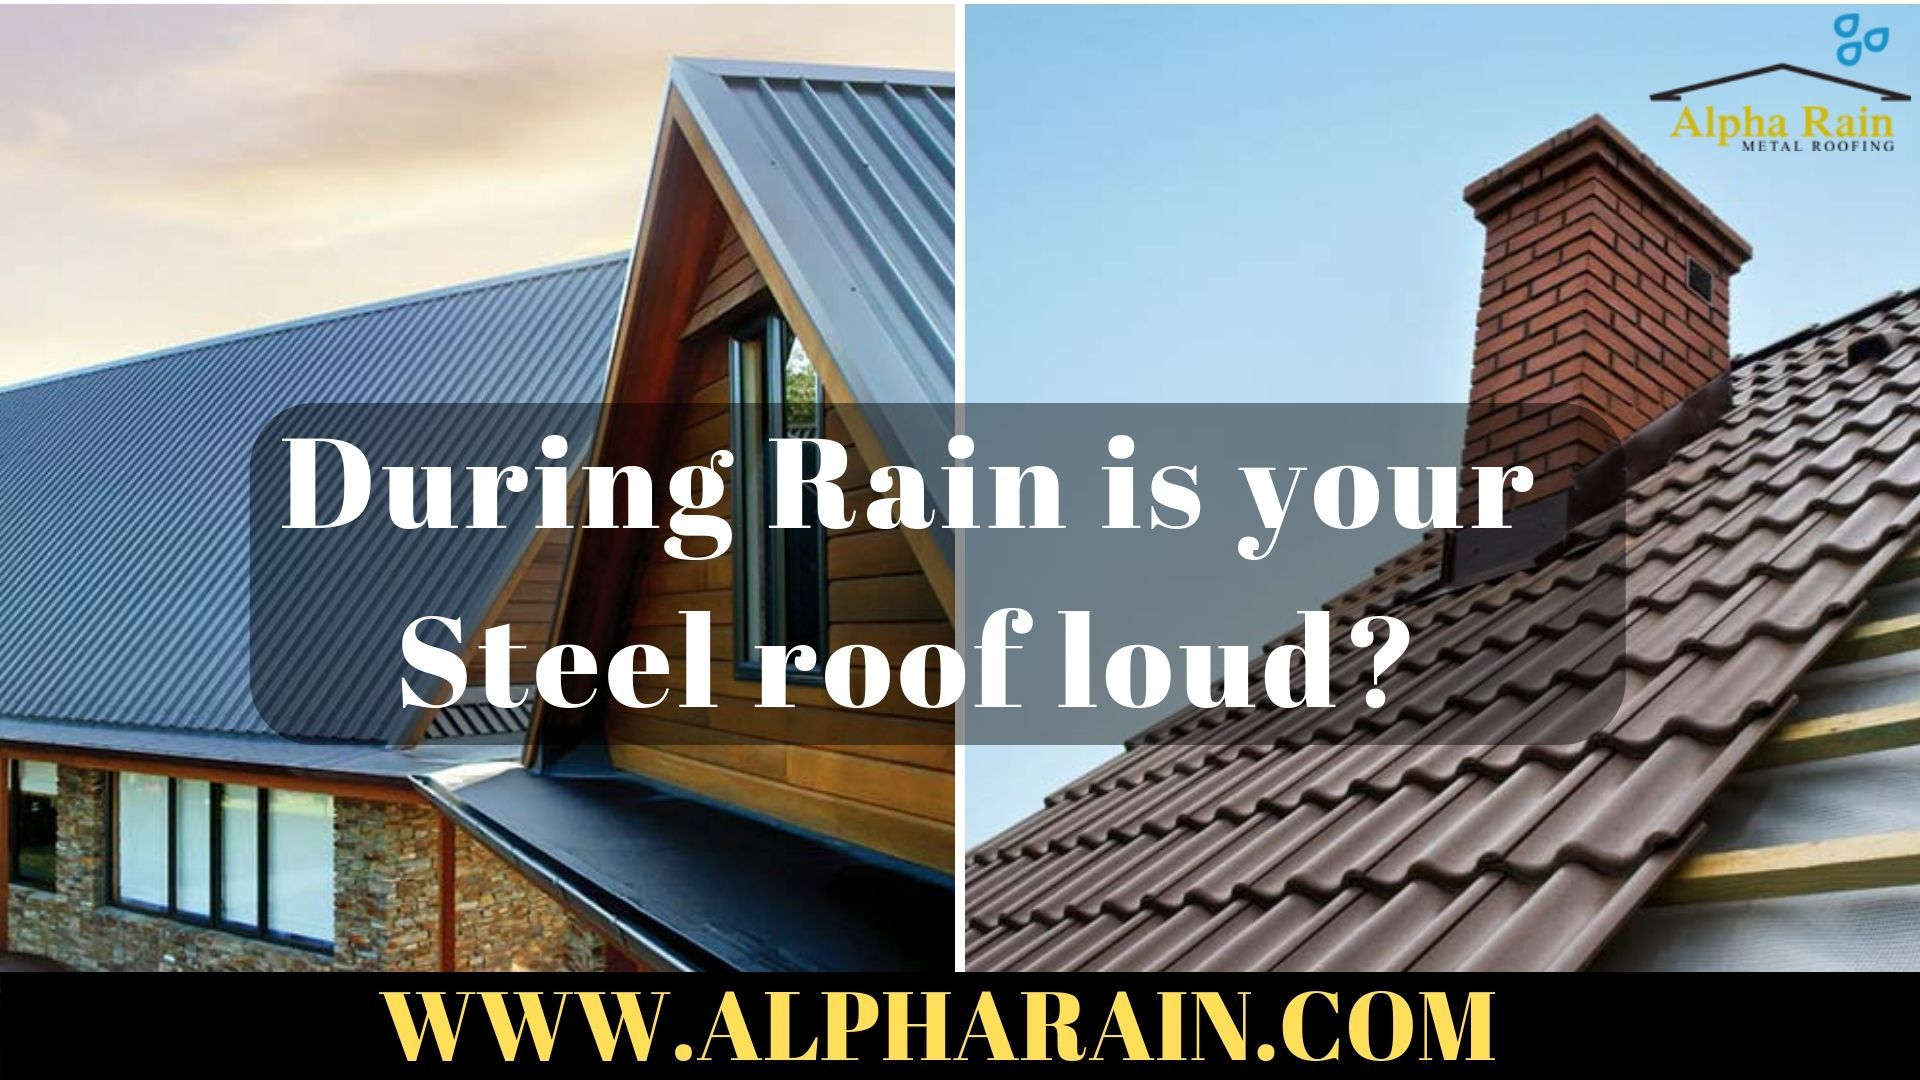 During Rain Is Your Steel Roof Loud Metal Roof Roofing Residential Metal Roofing